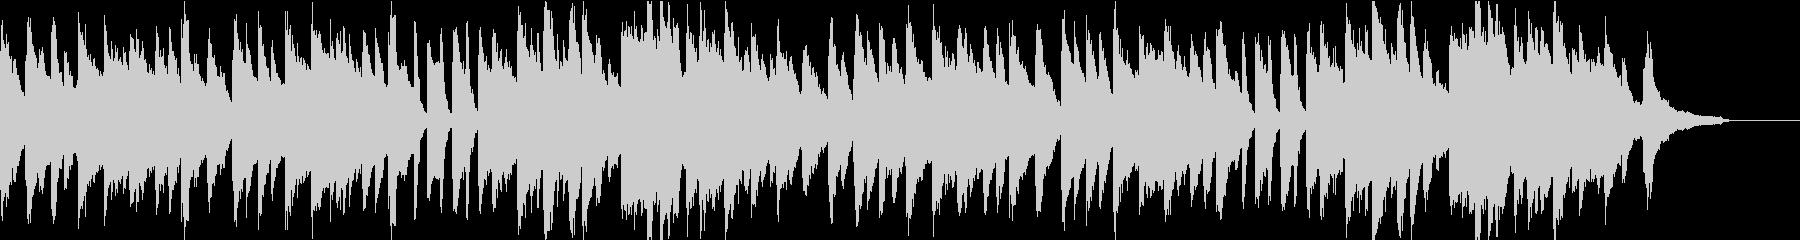 ABCの歌・きらきら星 ピアノ伴奏の未再生の波形